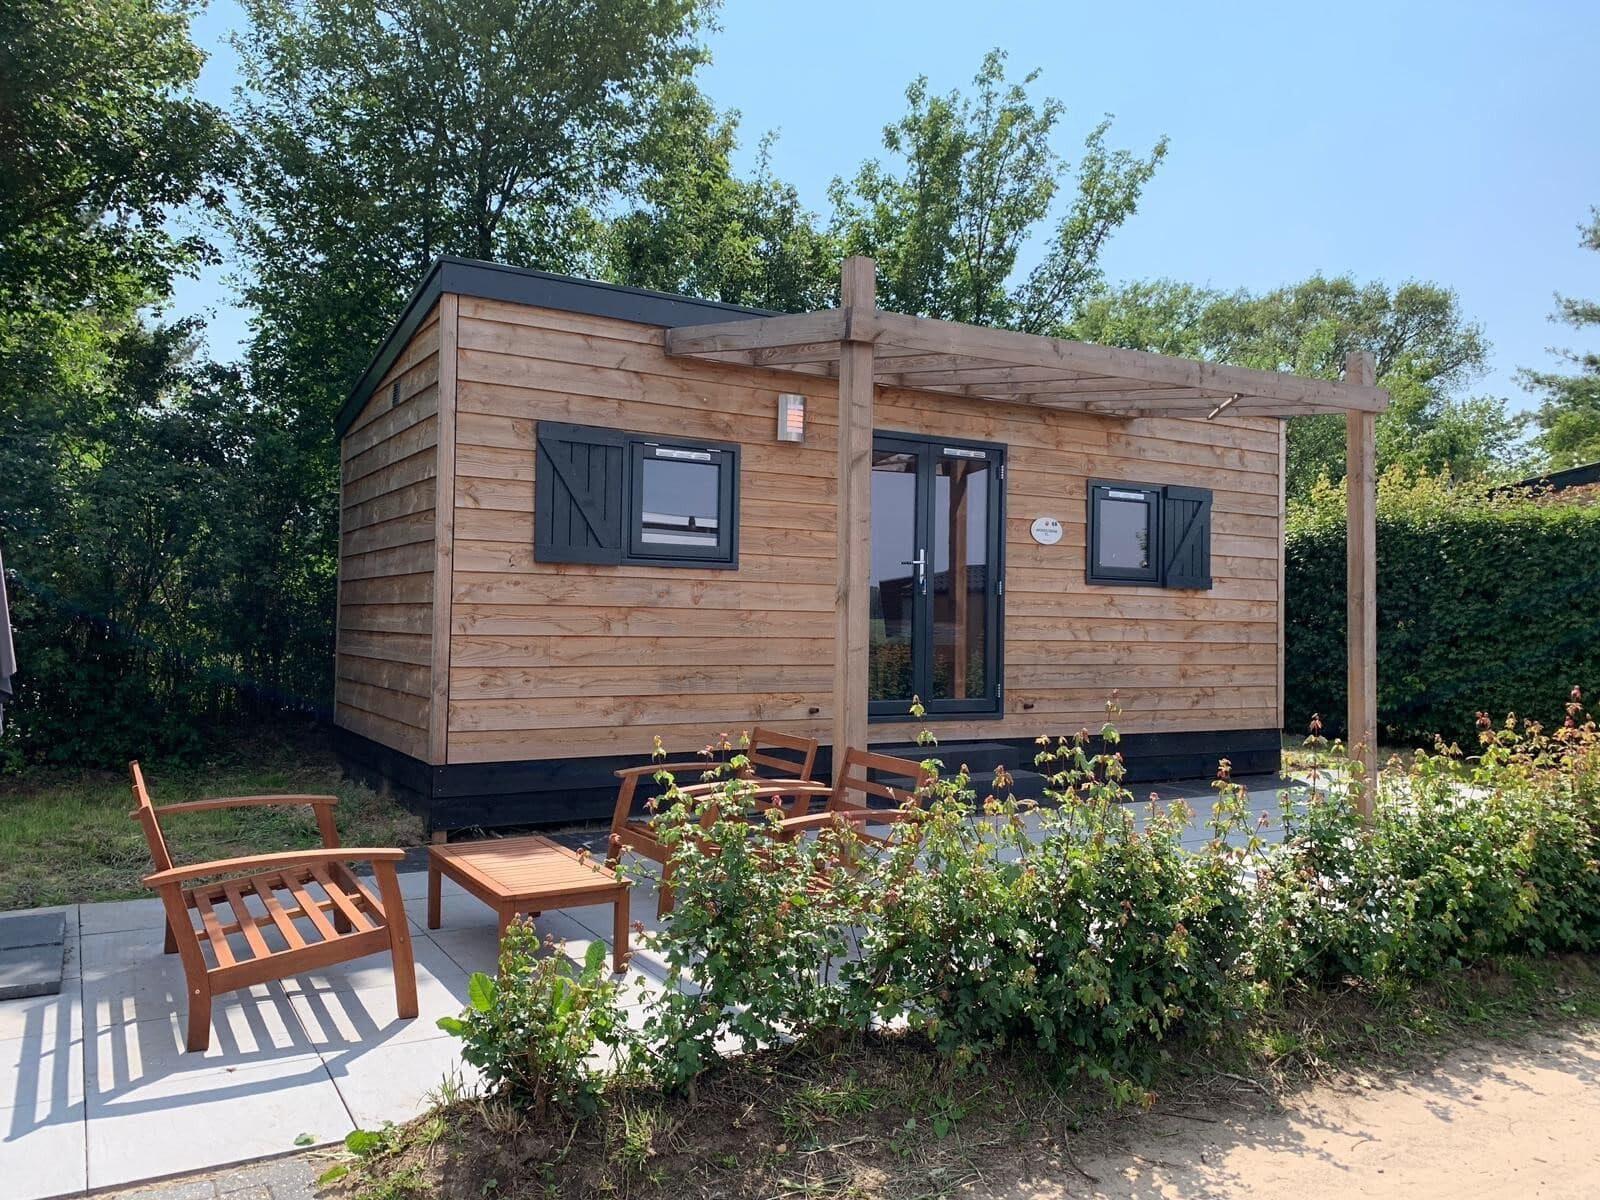 Vakantiepark Molke - Trekkershut in Twente - Header